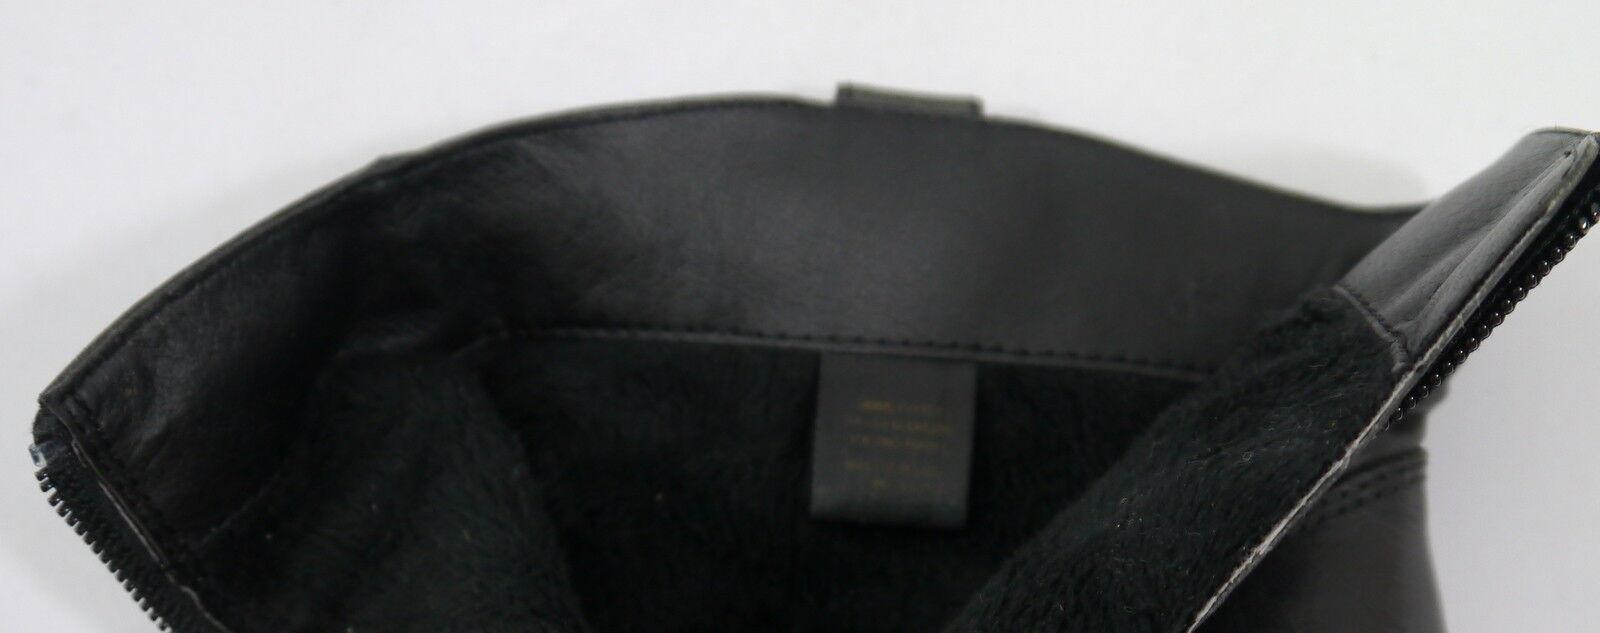 Jana Gr. Fashion bequeme Da. Stiefelette 2500-3-013-10 schwarz Gr. Jana 5 1/2=38,5 G NEU 18d604